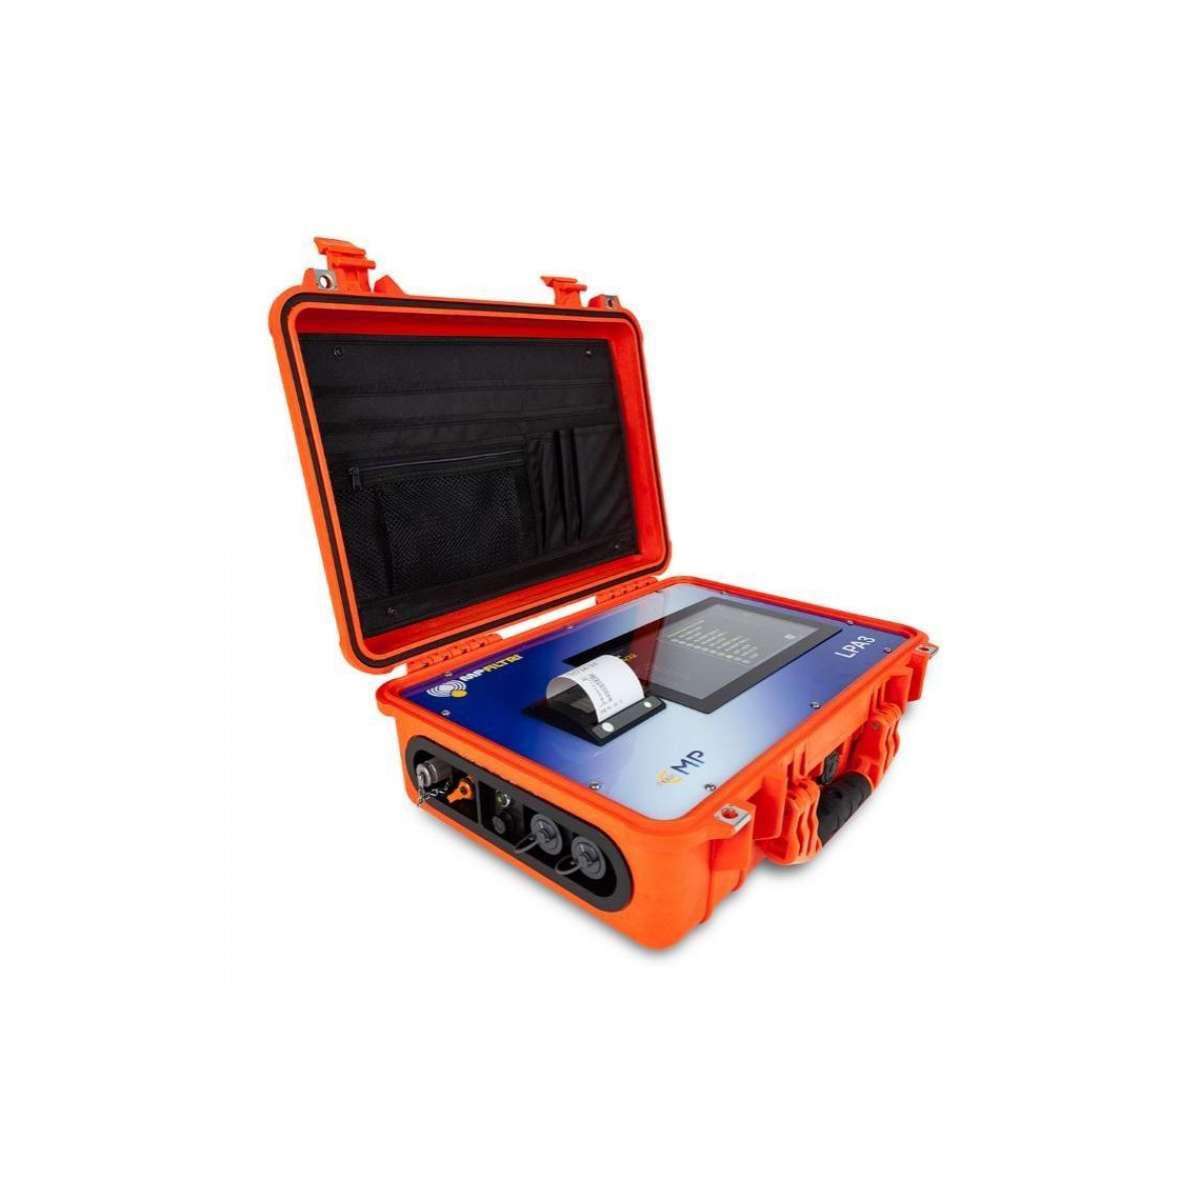 LPA3 Portable Particle Counter